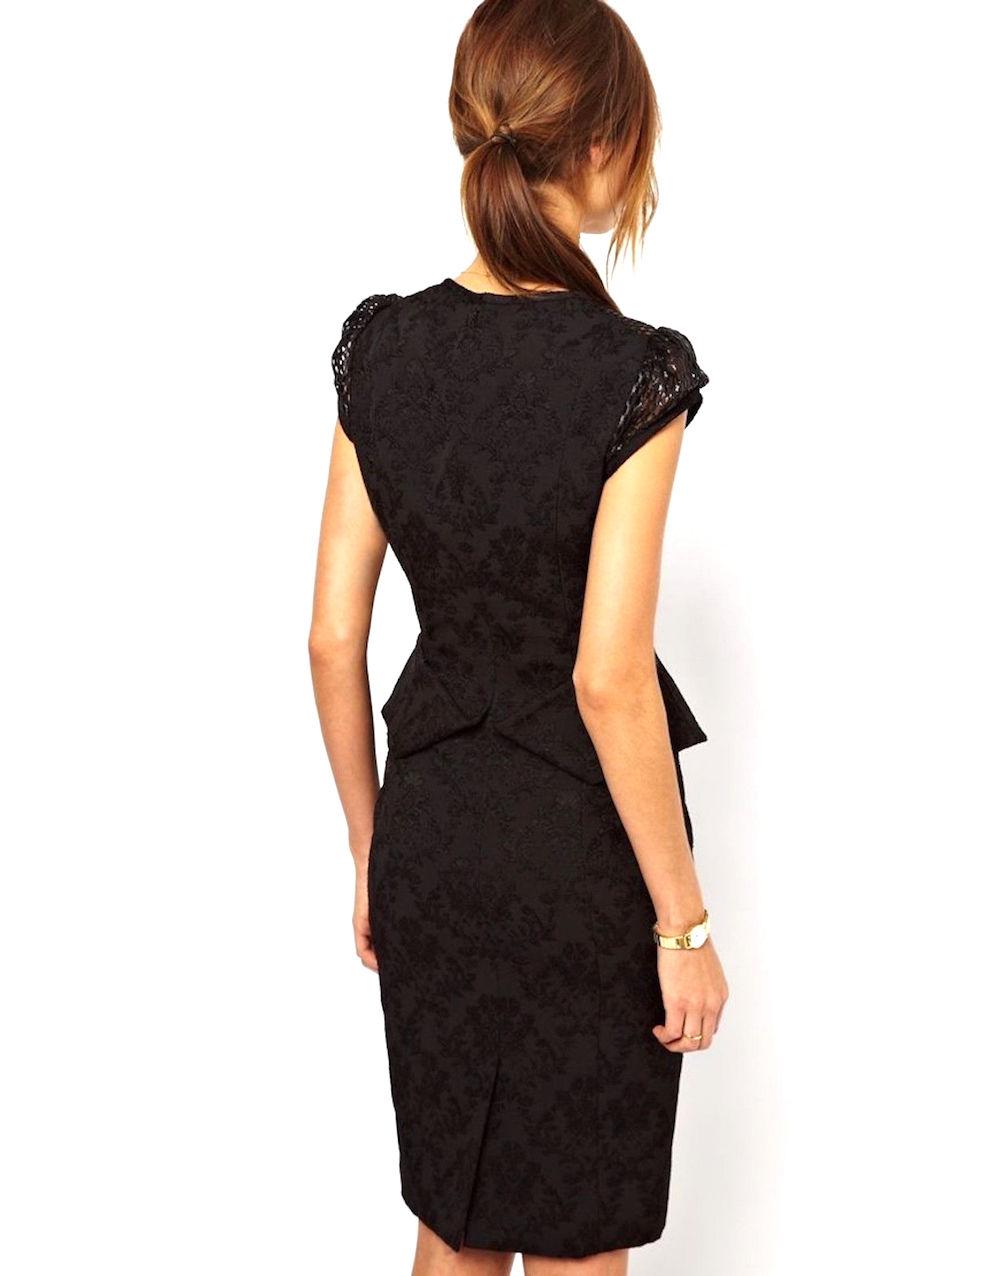 Black dress karen millen - Black Dress Karen Millen 42